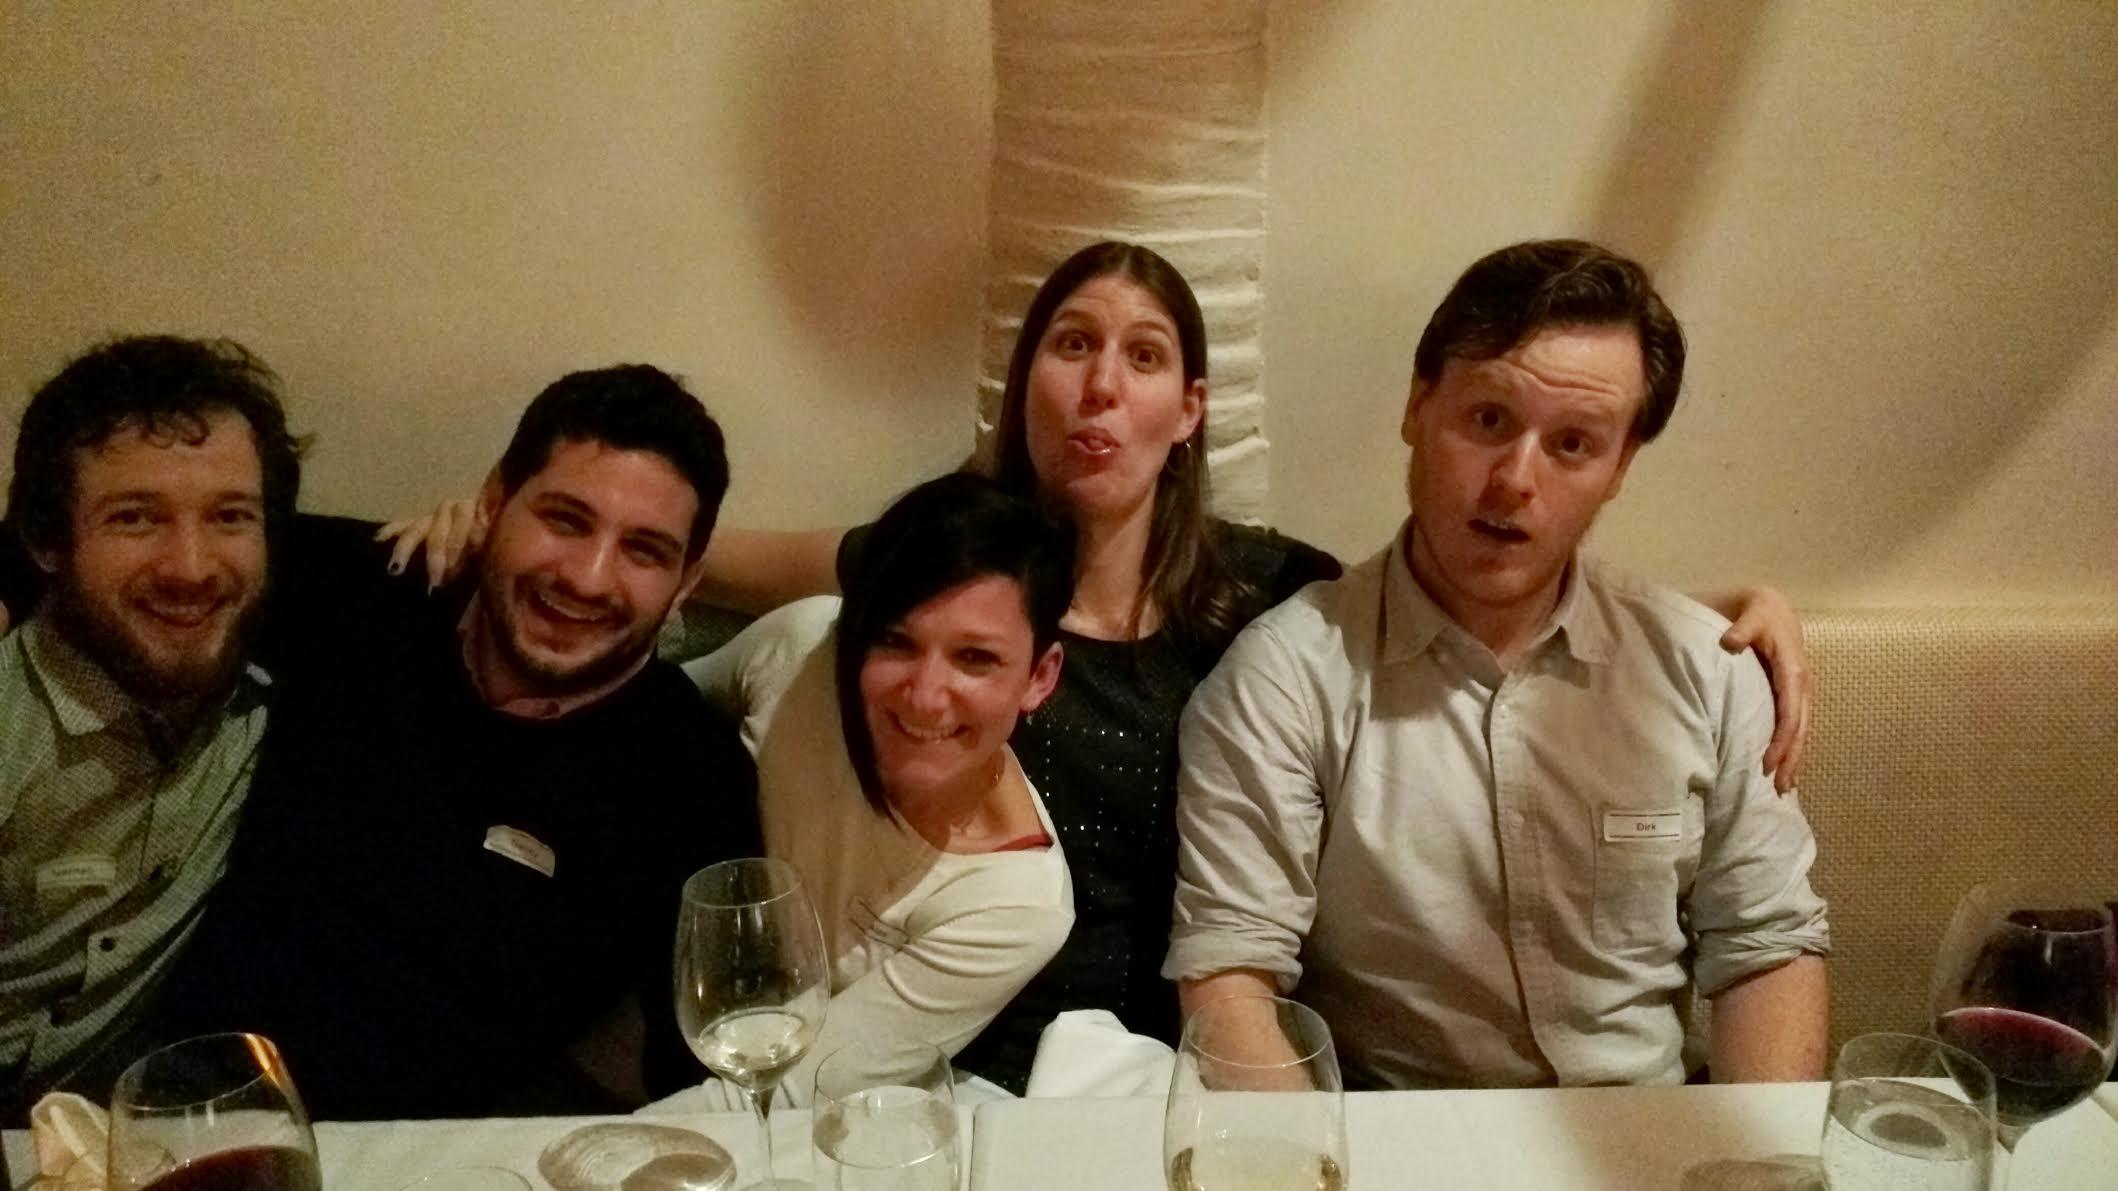 Nathan, Alex, Luc, Nicole, Dirk